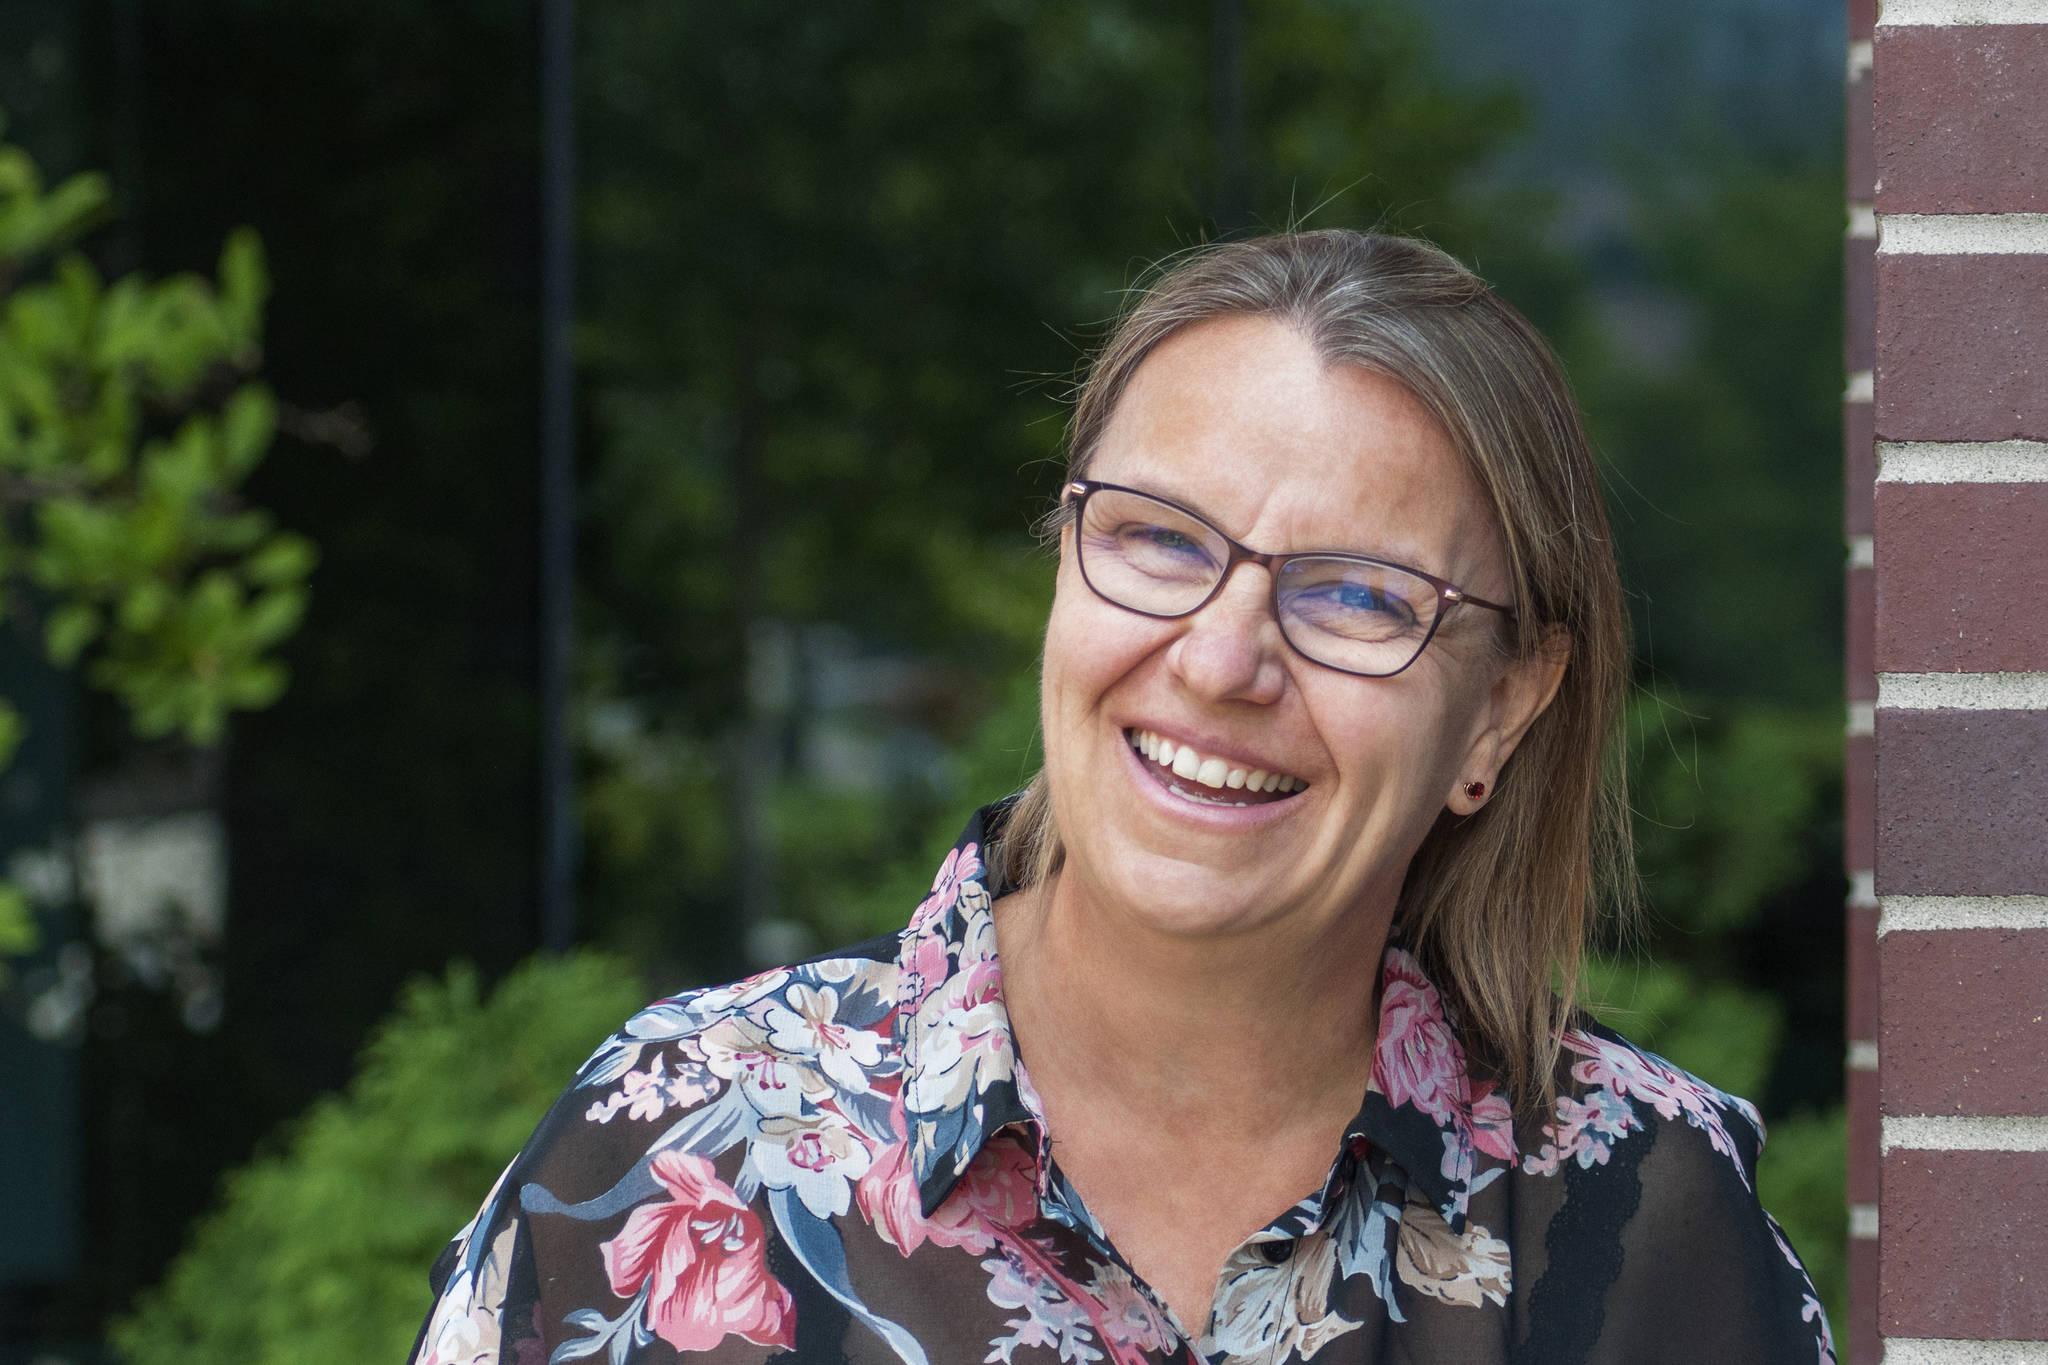 Susan Murch is a chemistry professor at UBC's Okanagan campus. - UBCO